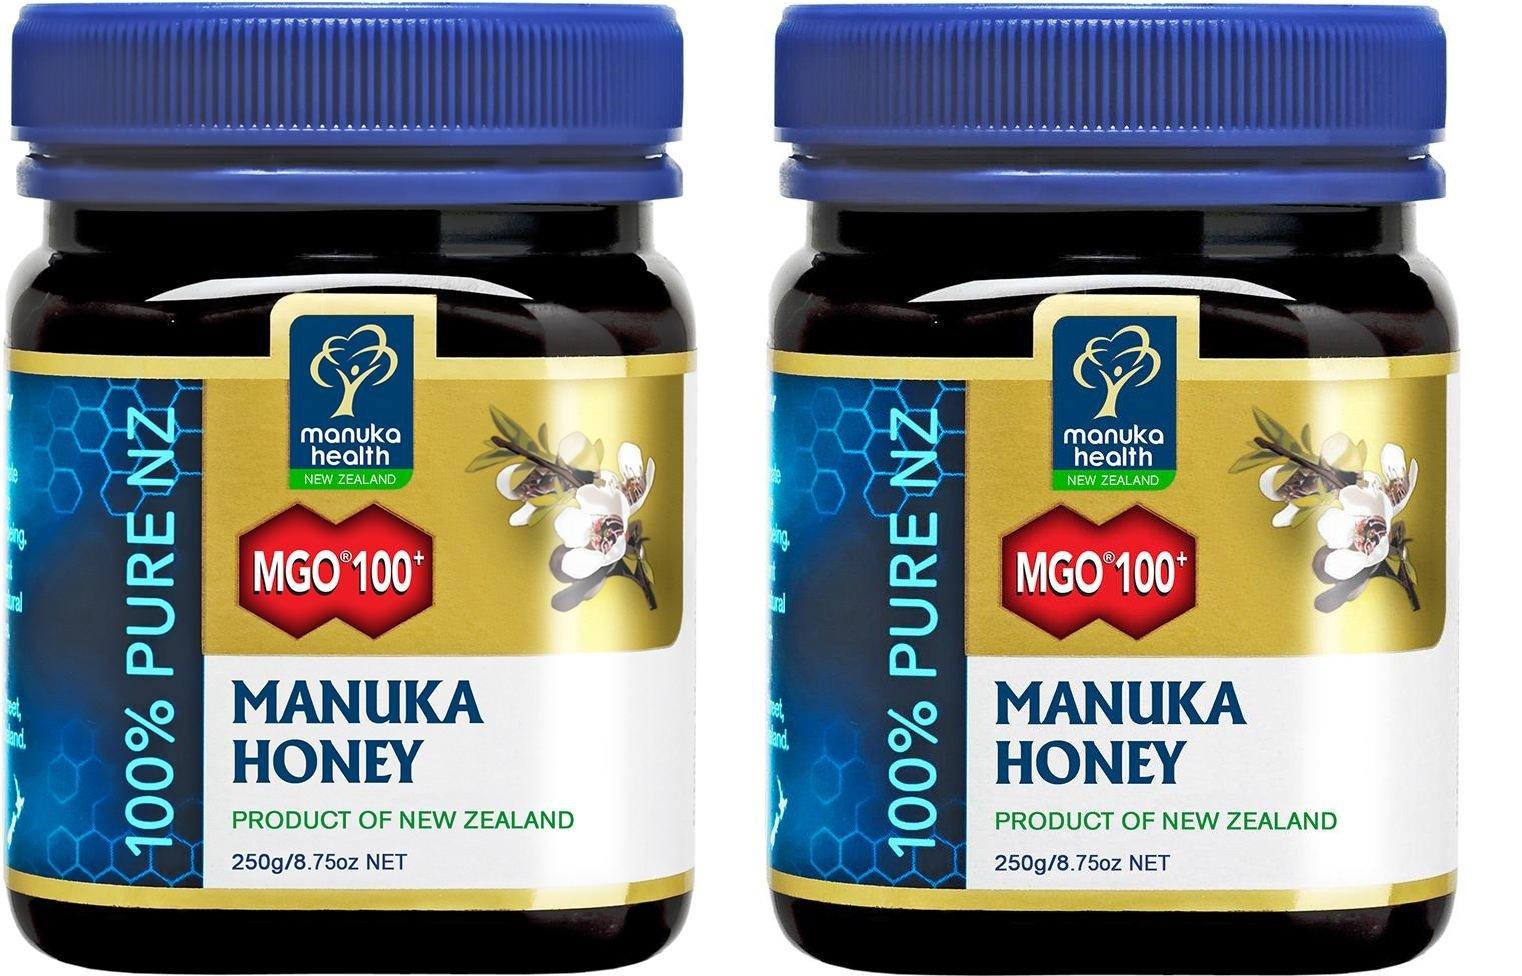 MANUKA HEALTH - MIELE DI MANUKA MGO100+ 2 CONFEZIONI DA 250 GRAMMI antibatterico, per mal di gola e